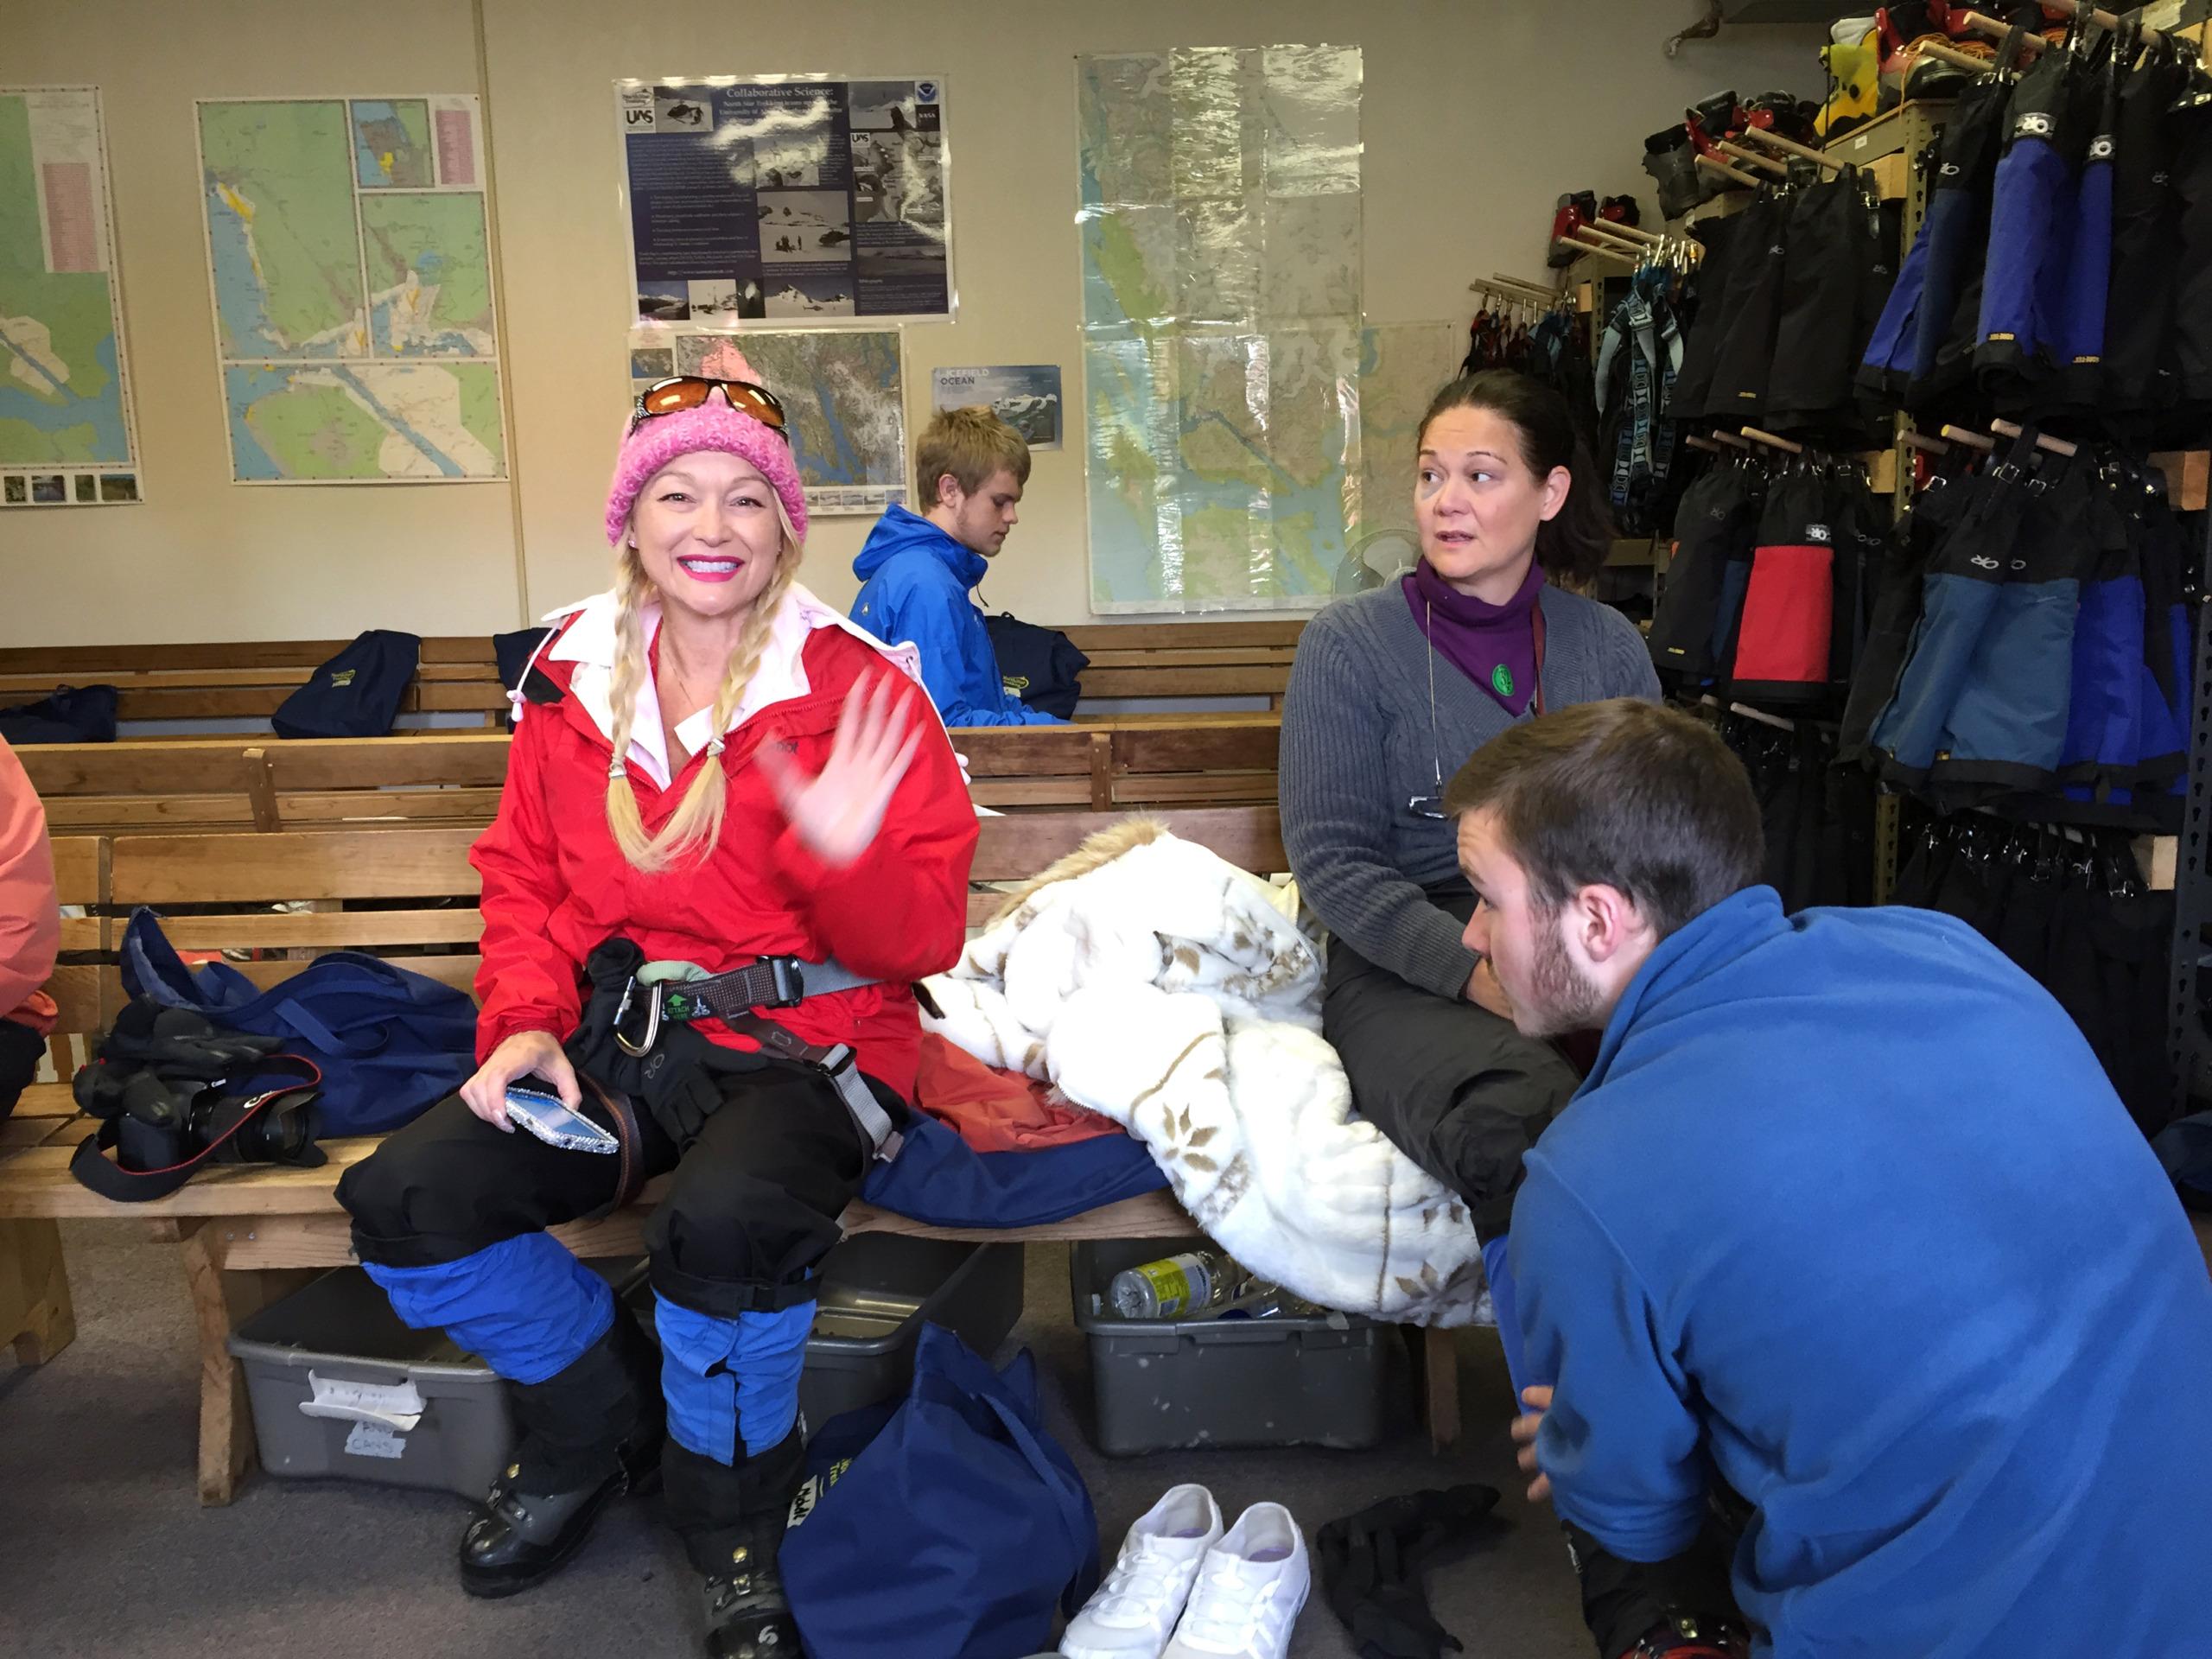 Alaska ice climbing gear